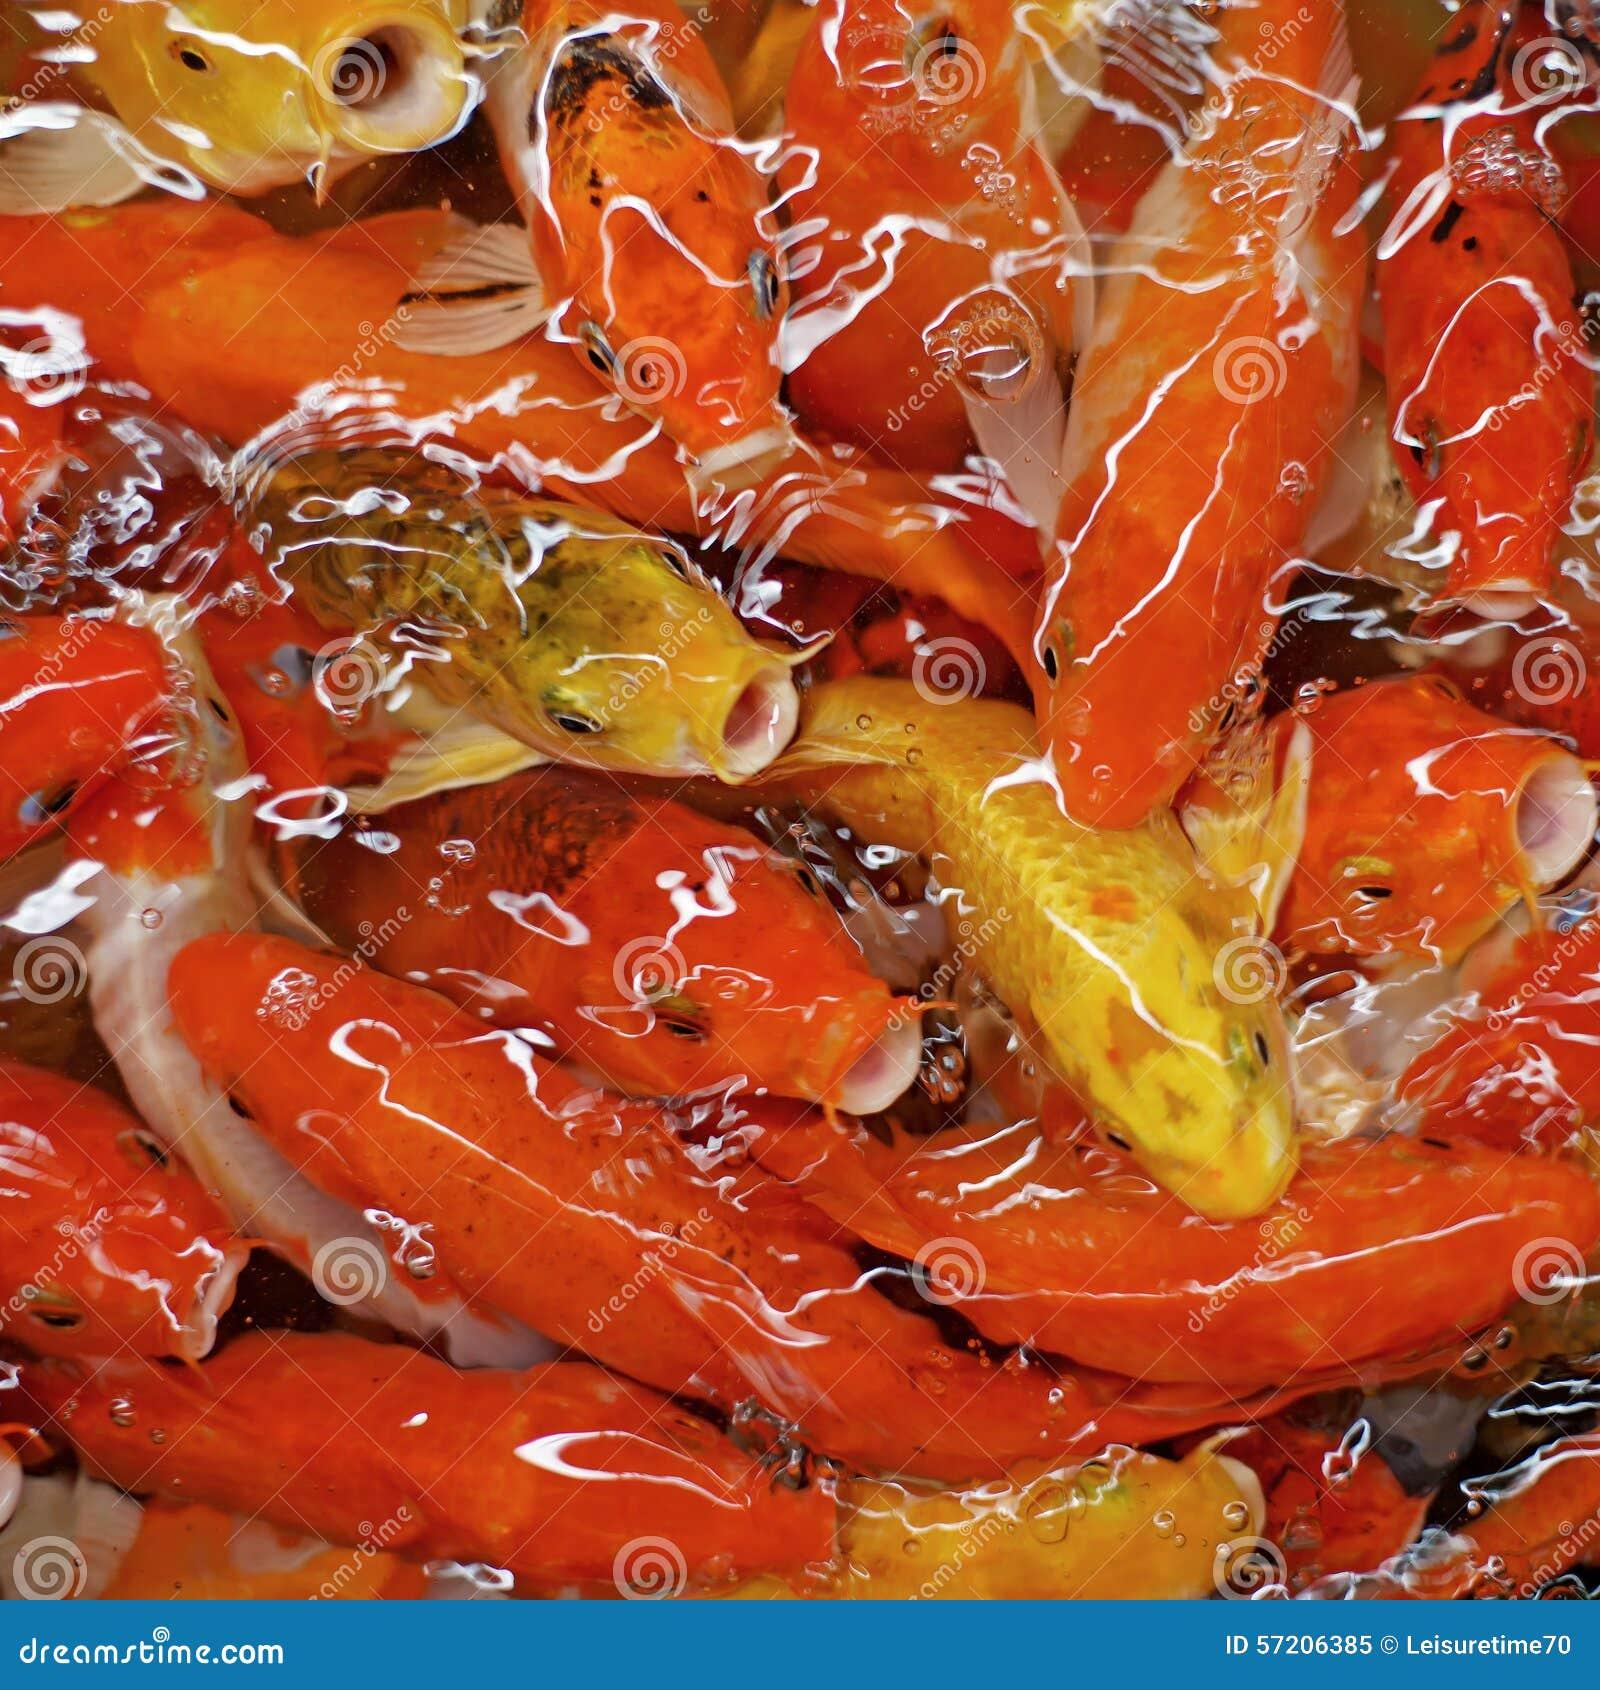 Fancy carp or koi fish stock image image of wild for Fancy koi fish